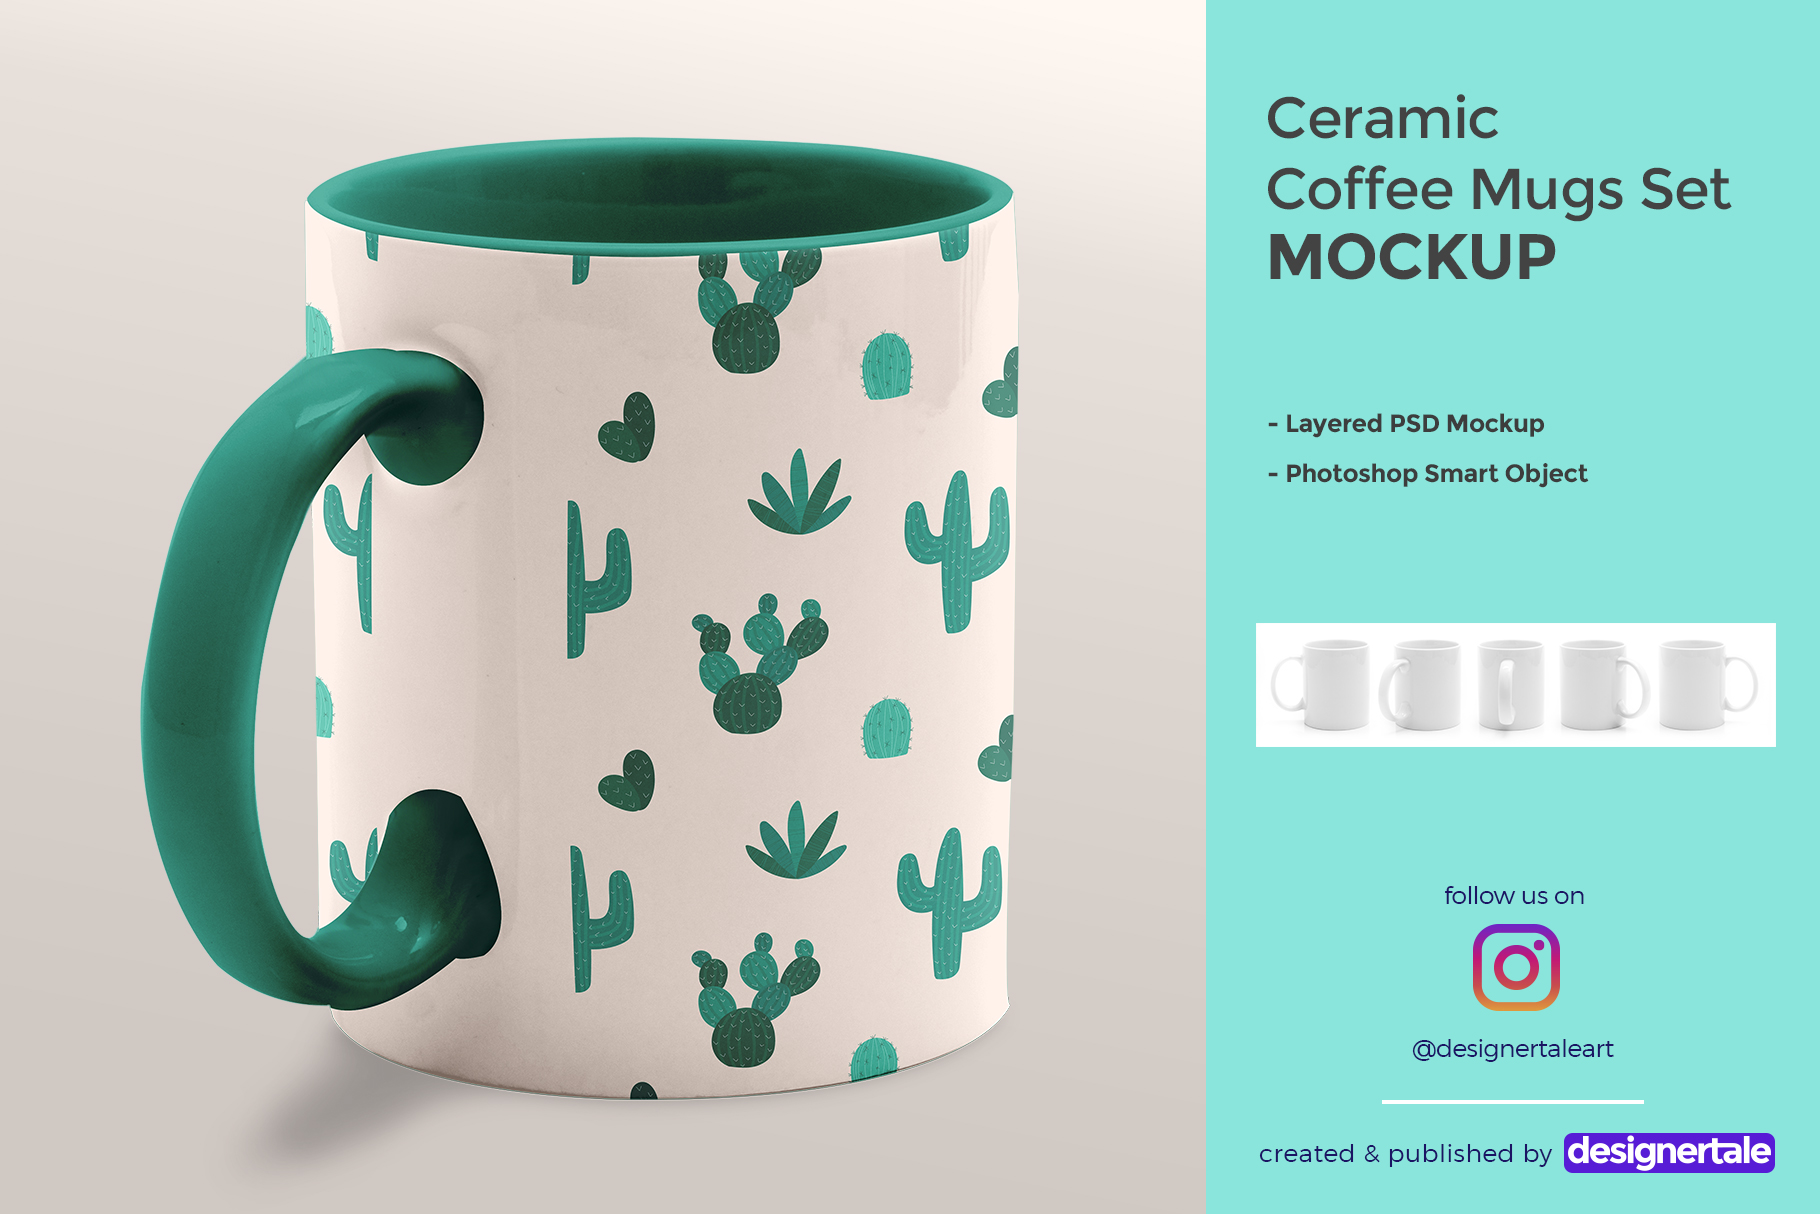 ceramic coffee mugs mockup set